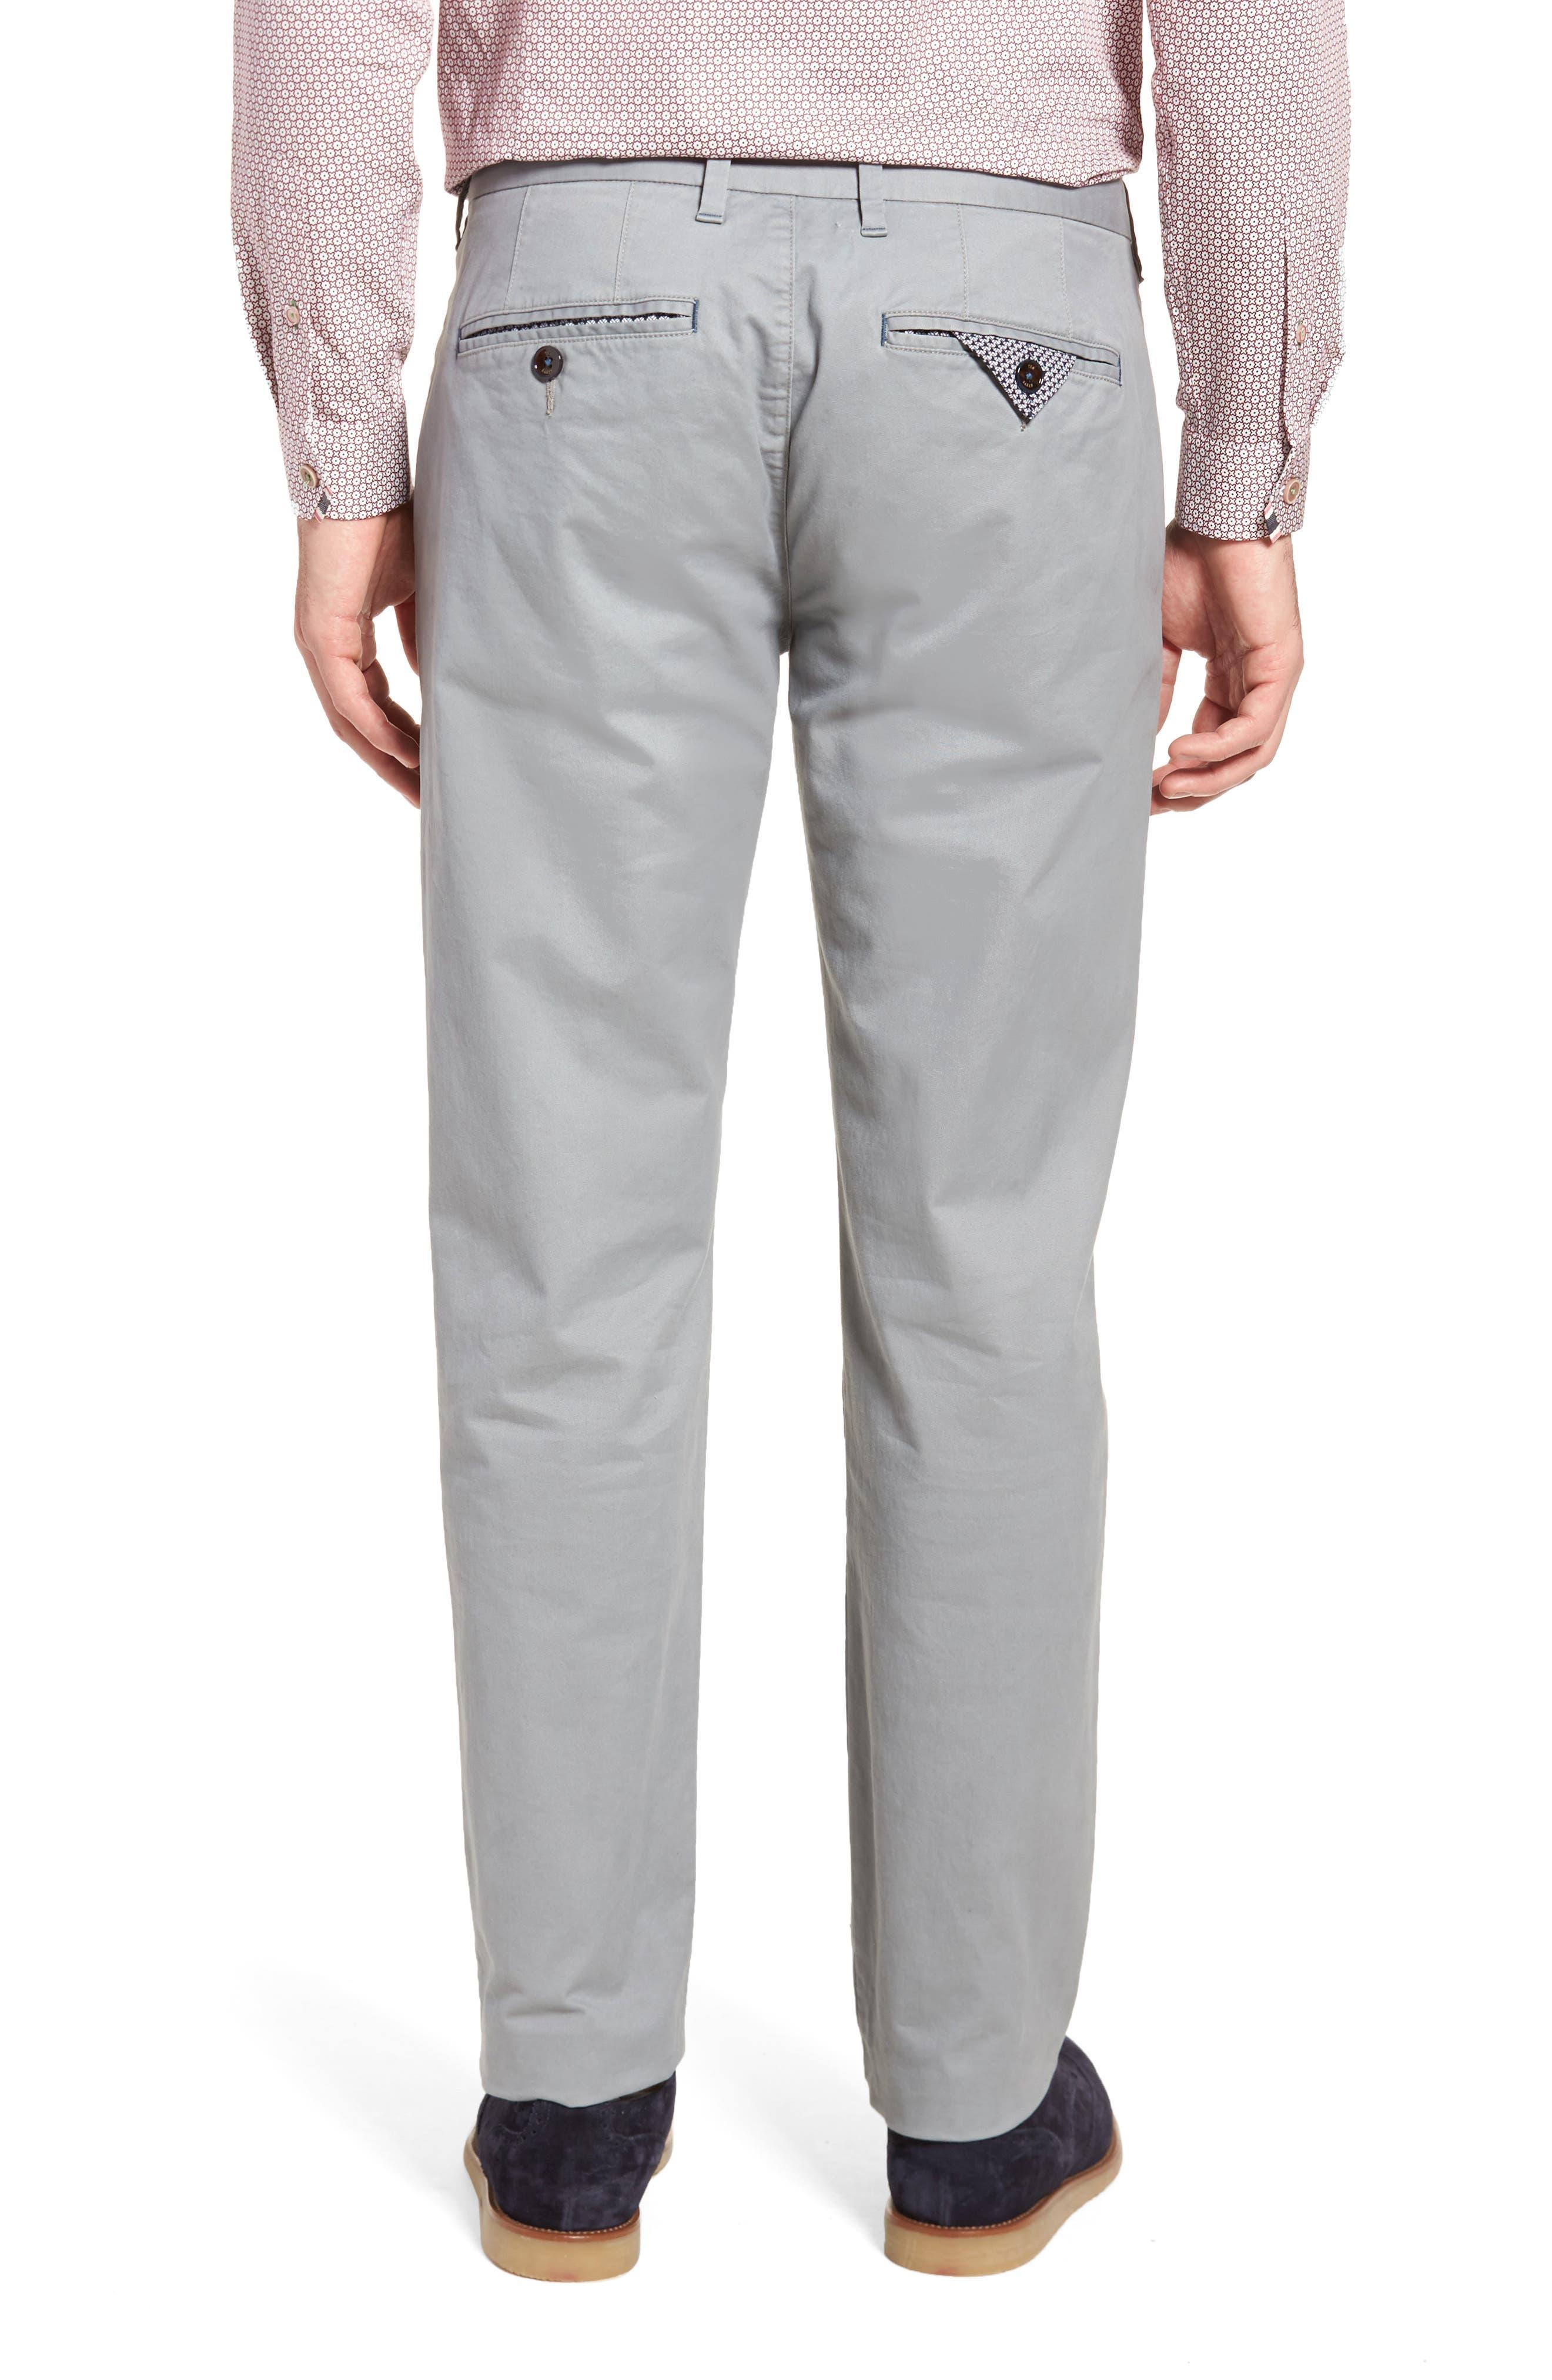 Proctt Flat Front Stretch Solid Cotton Pants,                             Alternate thumbnail 2, color,                             Light Grey